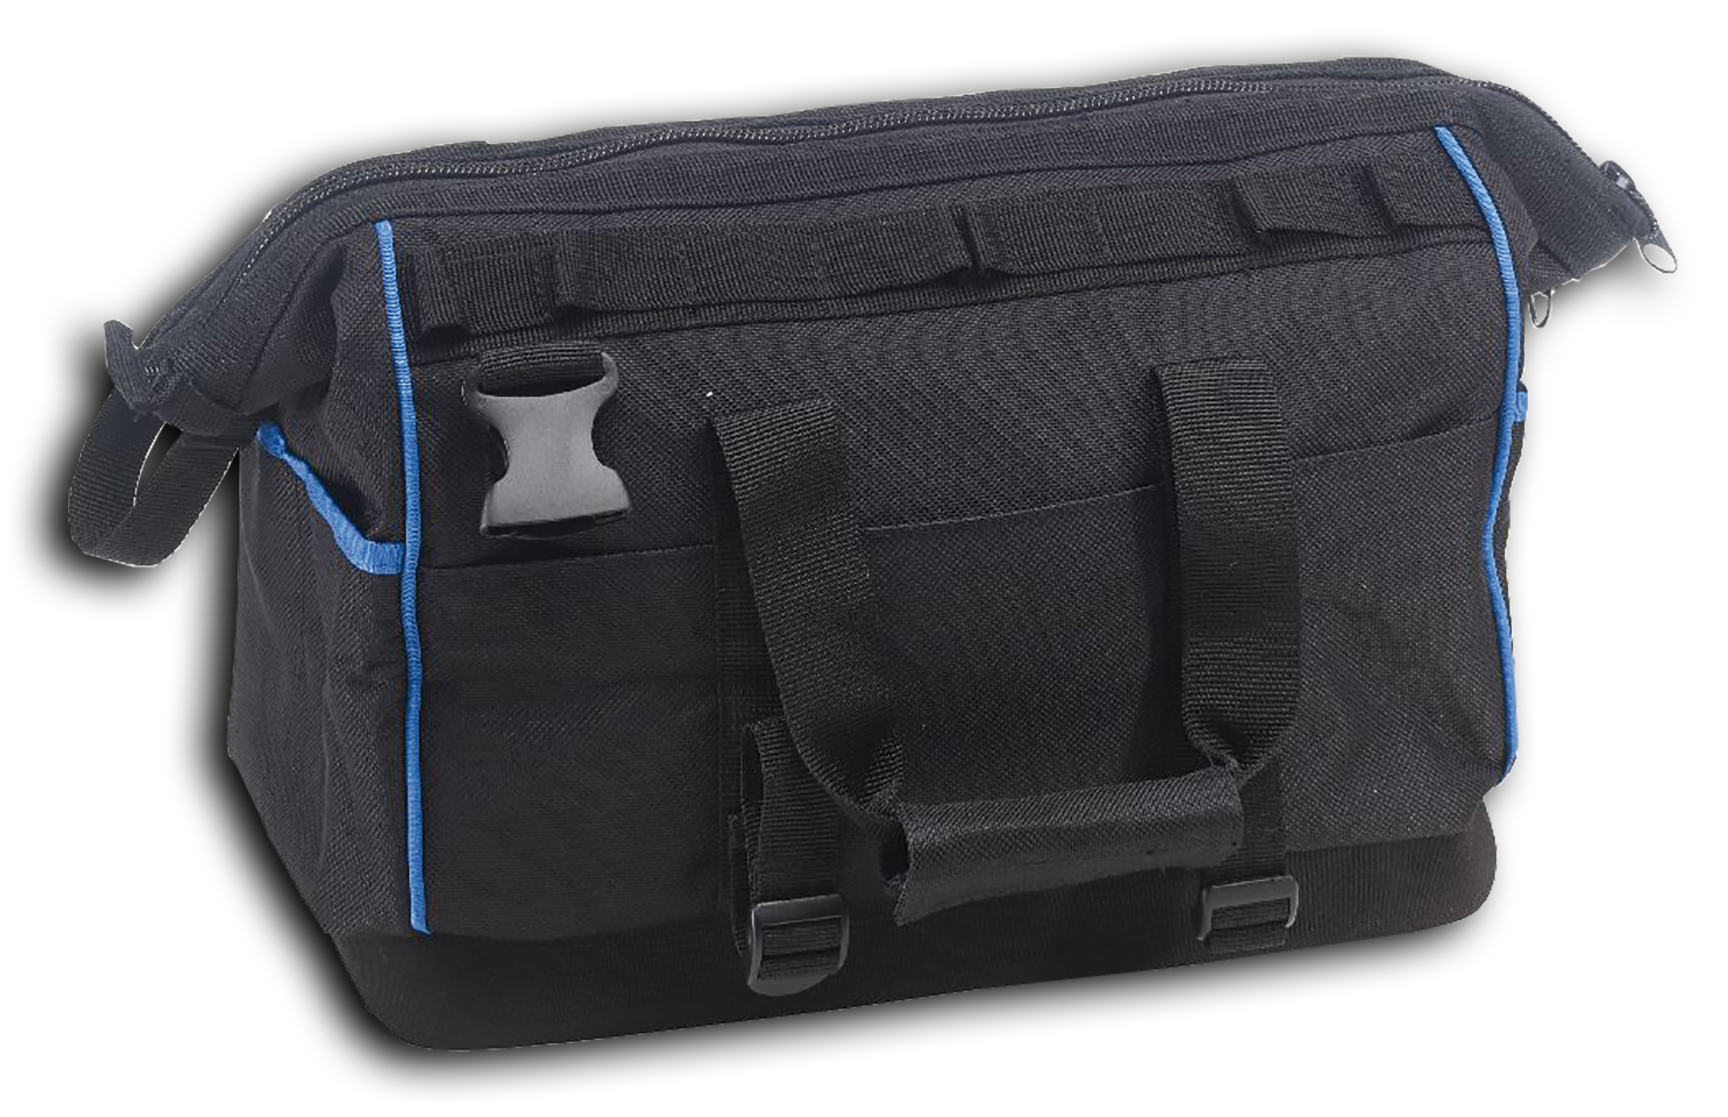 B&W tool.case carry